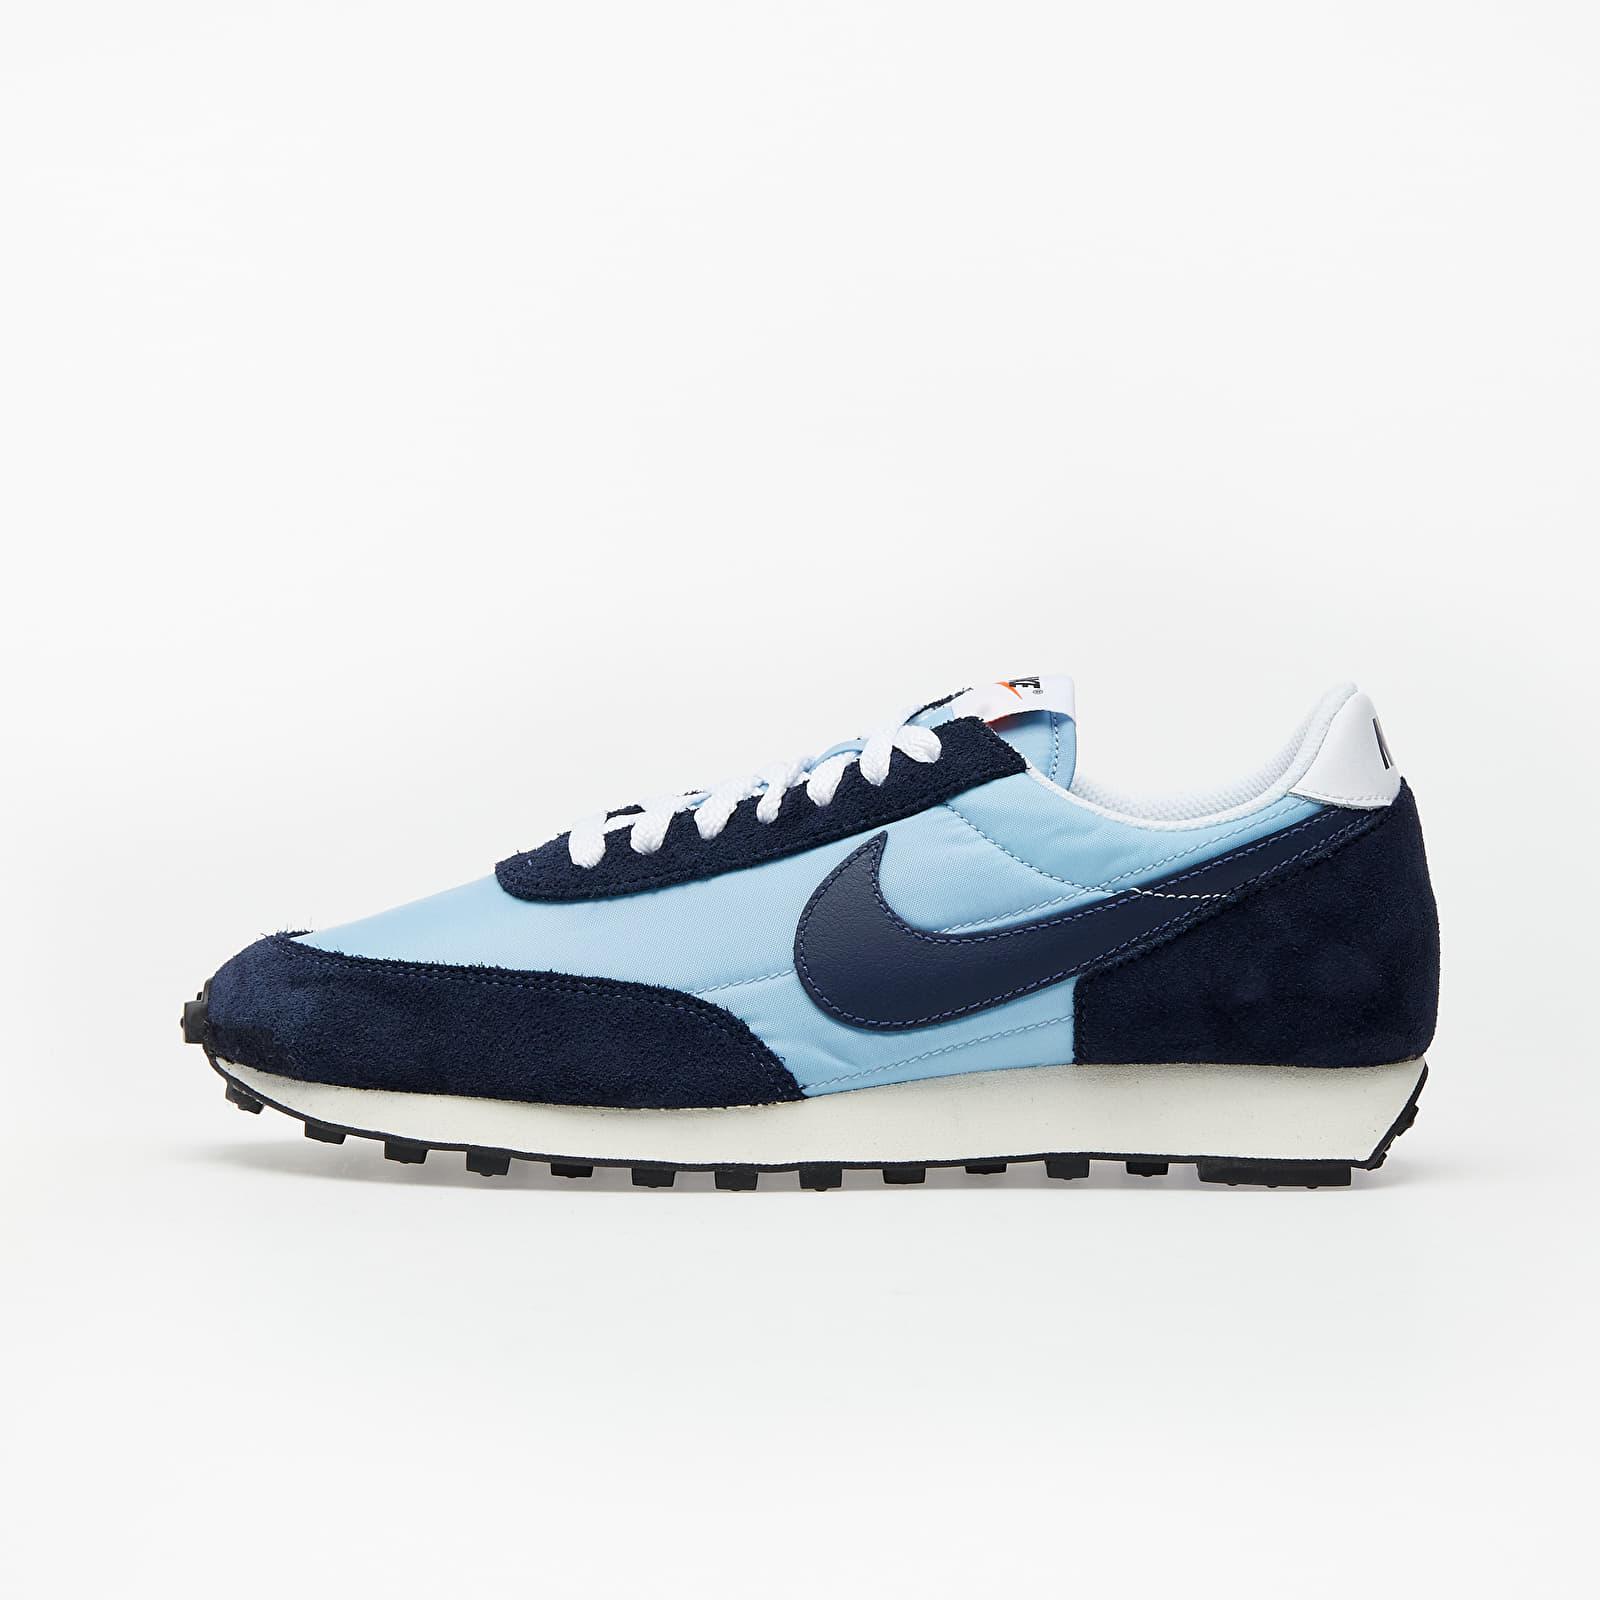 Pánske tenisky a topánky Nike Daybreak Lt Armory Blue/ Obsidian-White-Sail